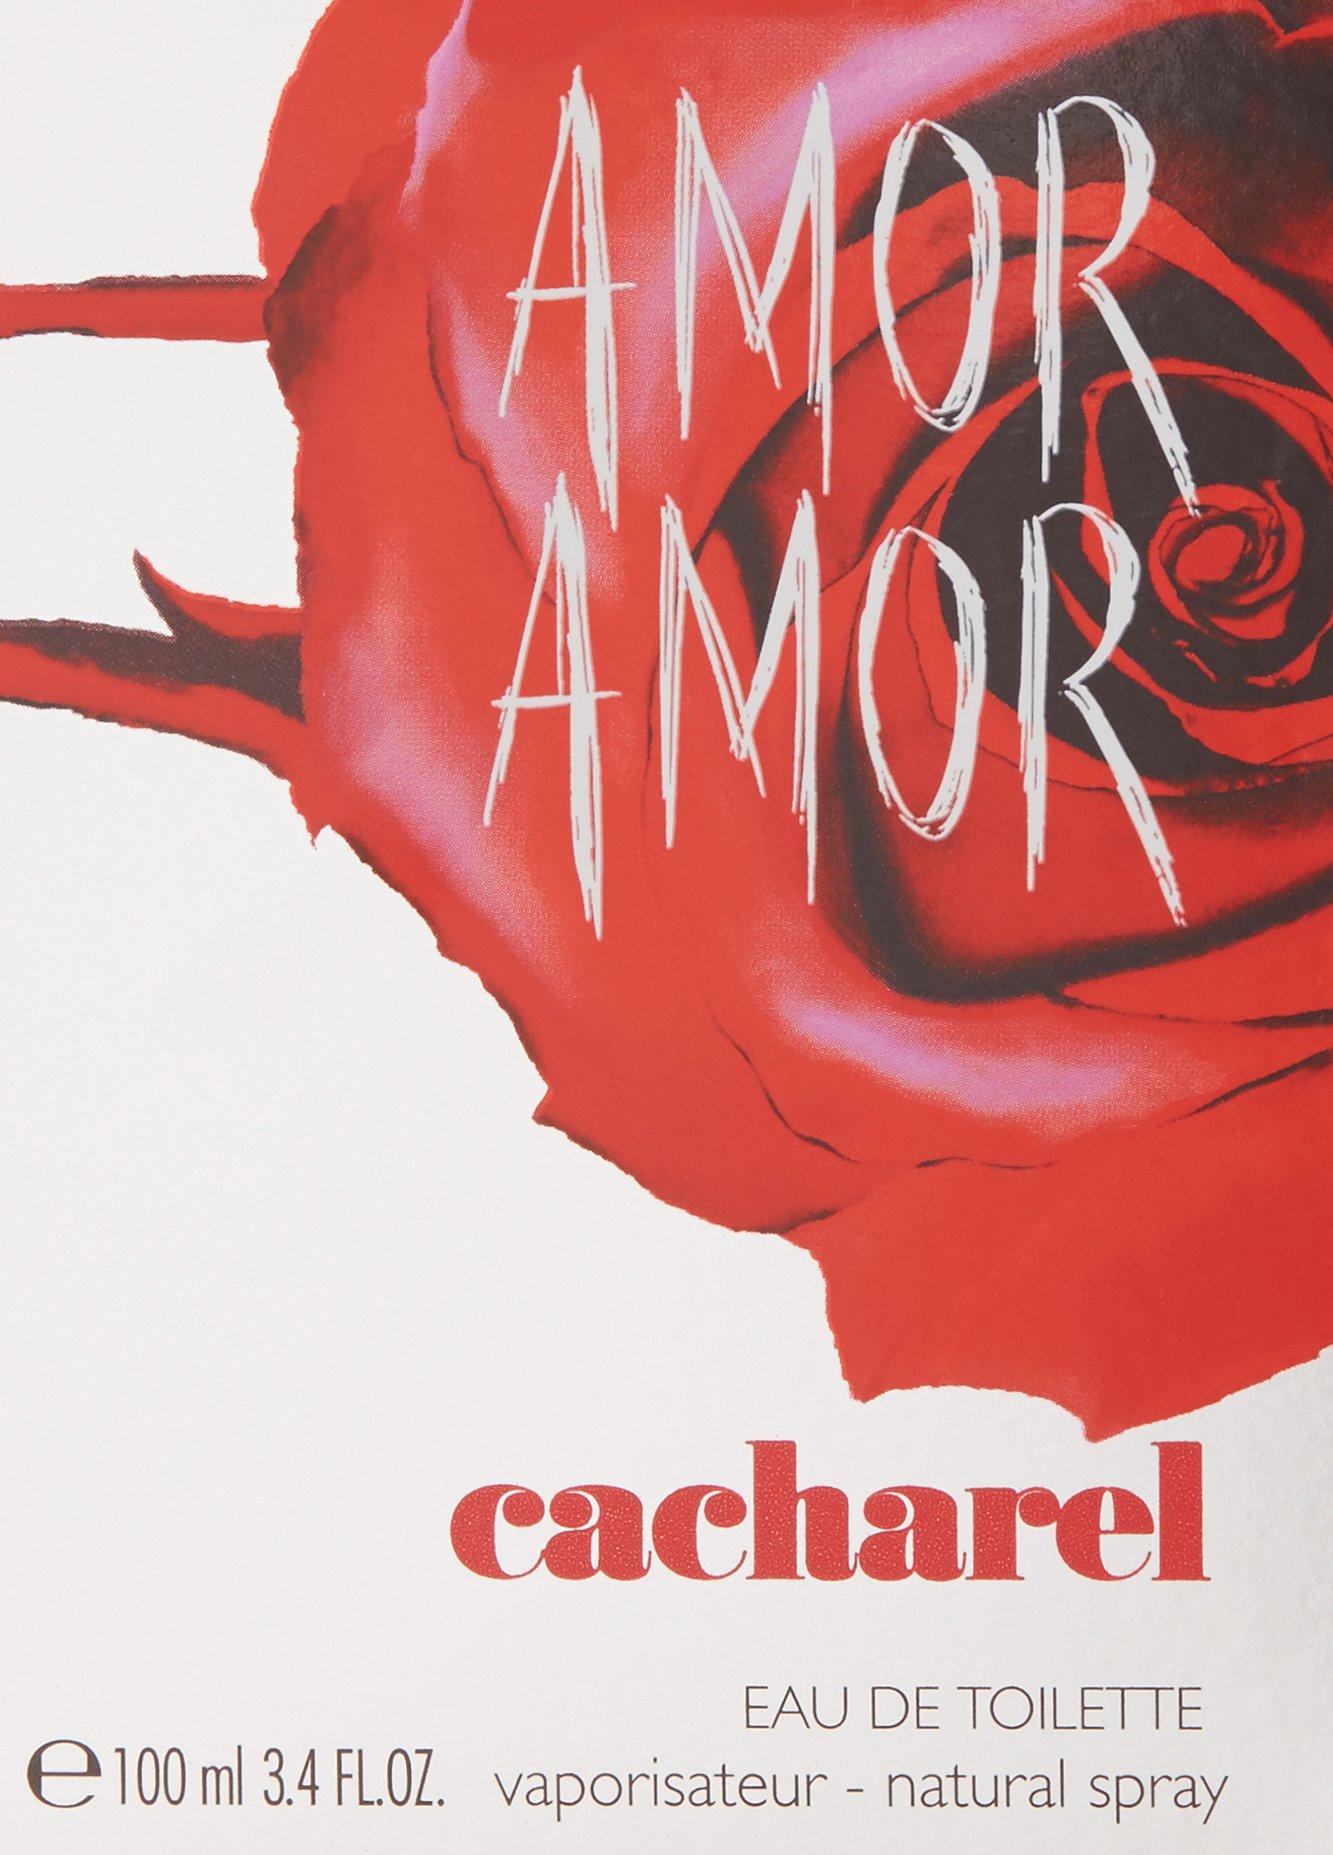 Cacharel Amor Amor Eau de Toilette Spray, 3.4 Fl Oz by Cacharel (Image #3)